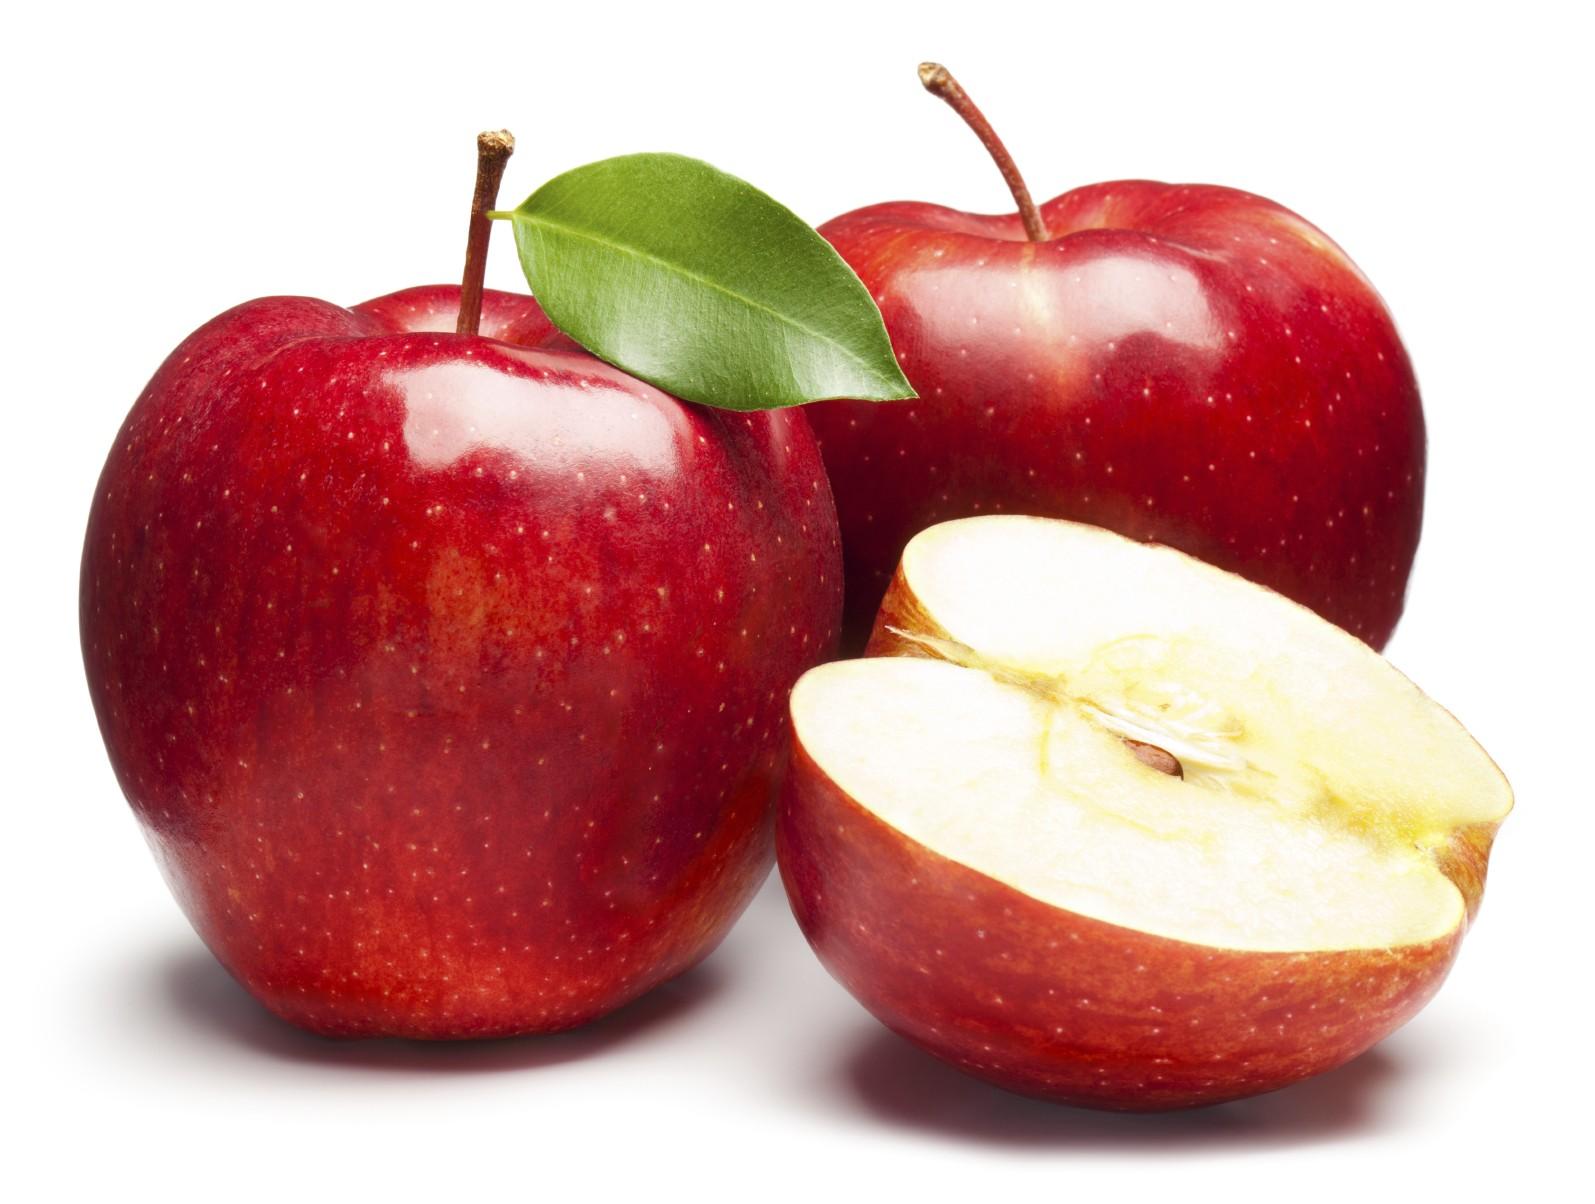 04_Apples.jpg